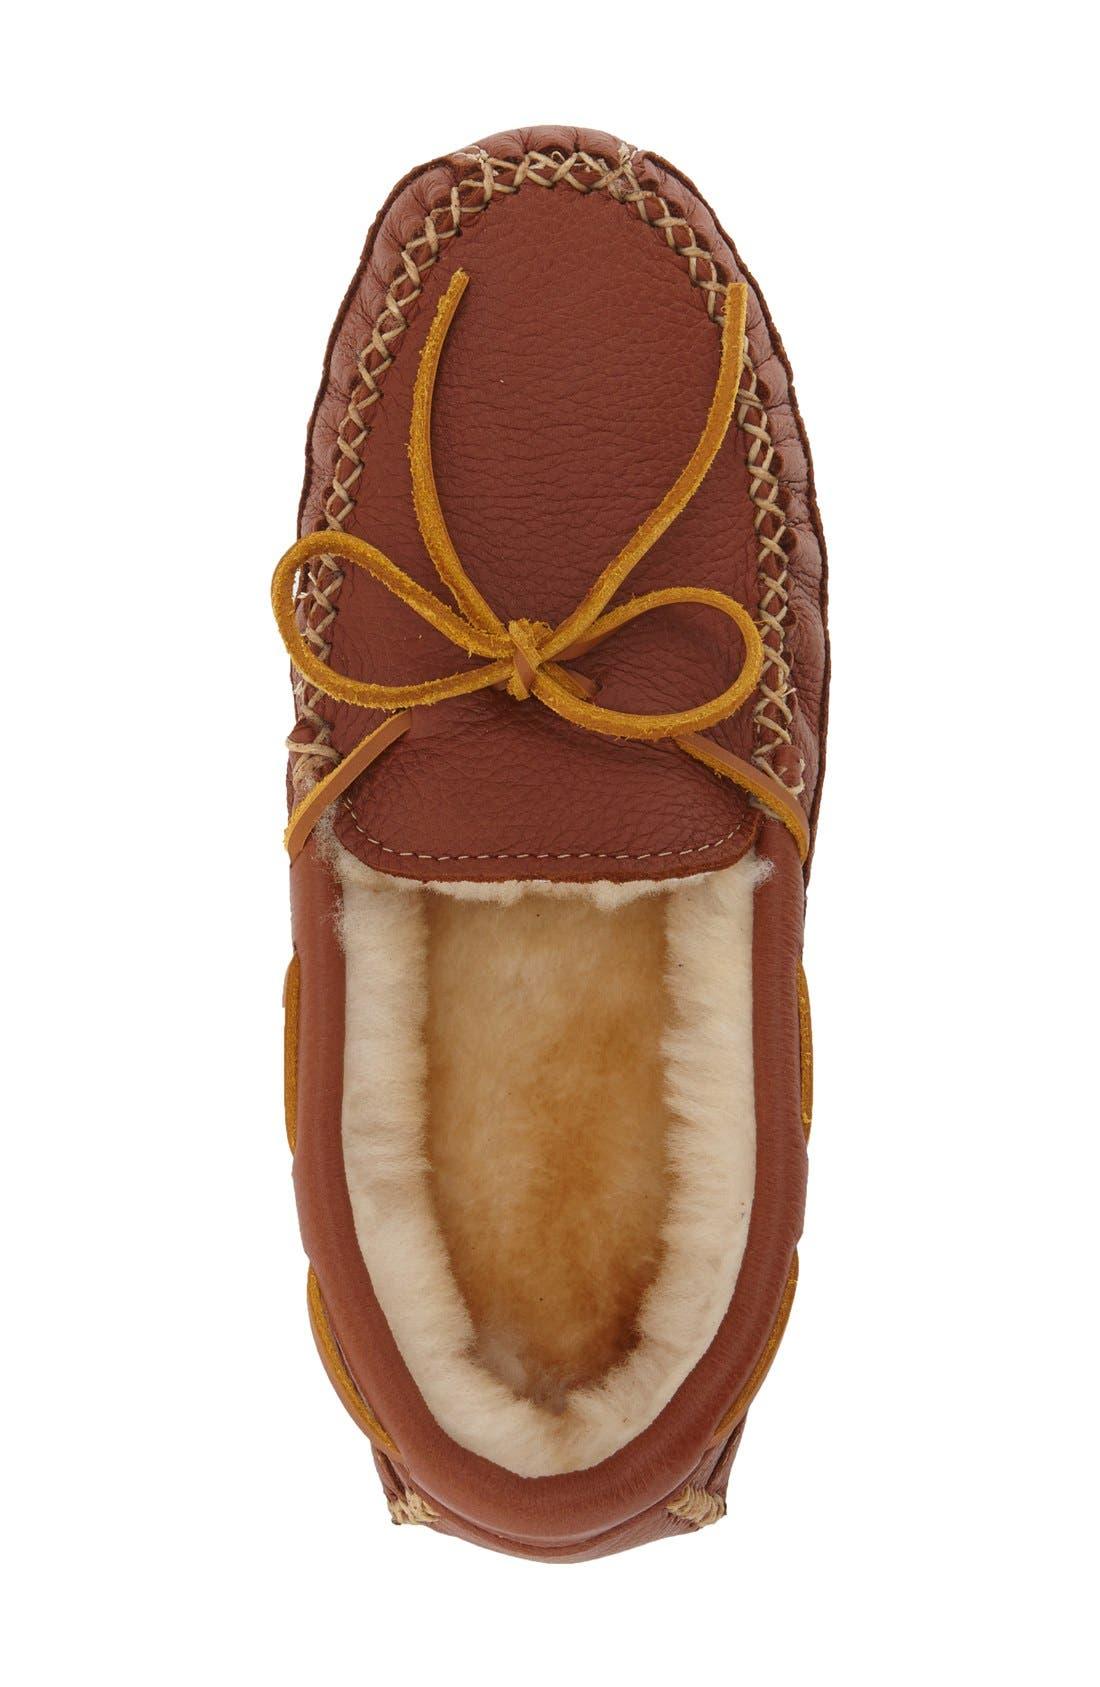 Genuine Shearling Lined Leather Slipper,                             Alternate thumbnail 3, color,                             CARMEL